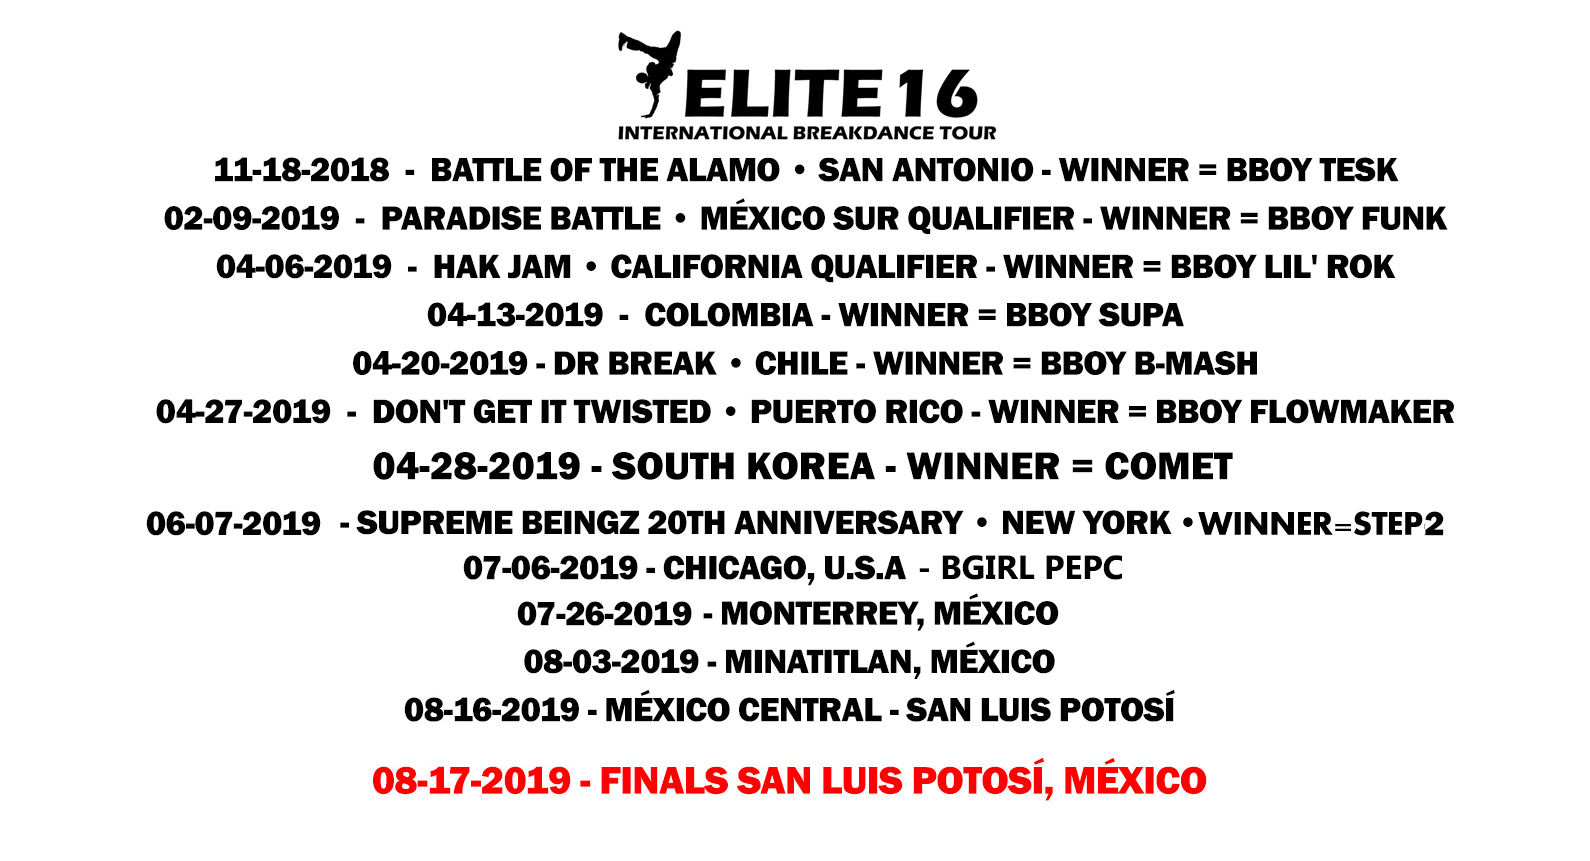 WINNERS UP TO DATE 07 14 2019.jpg